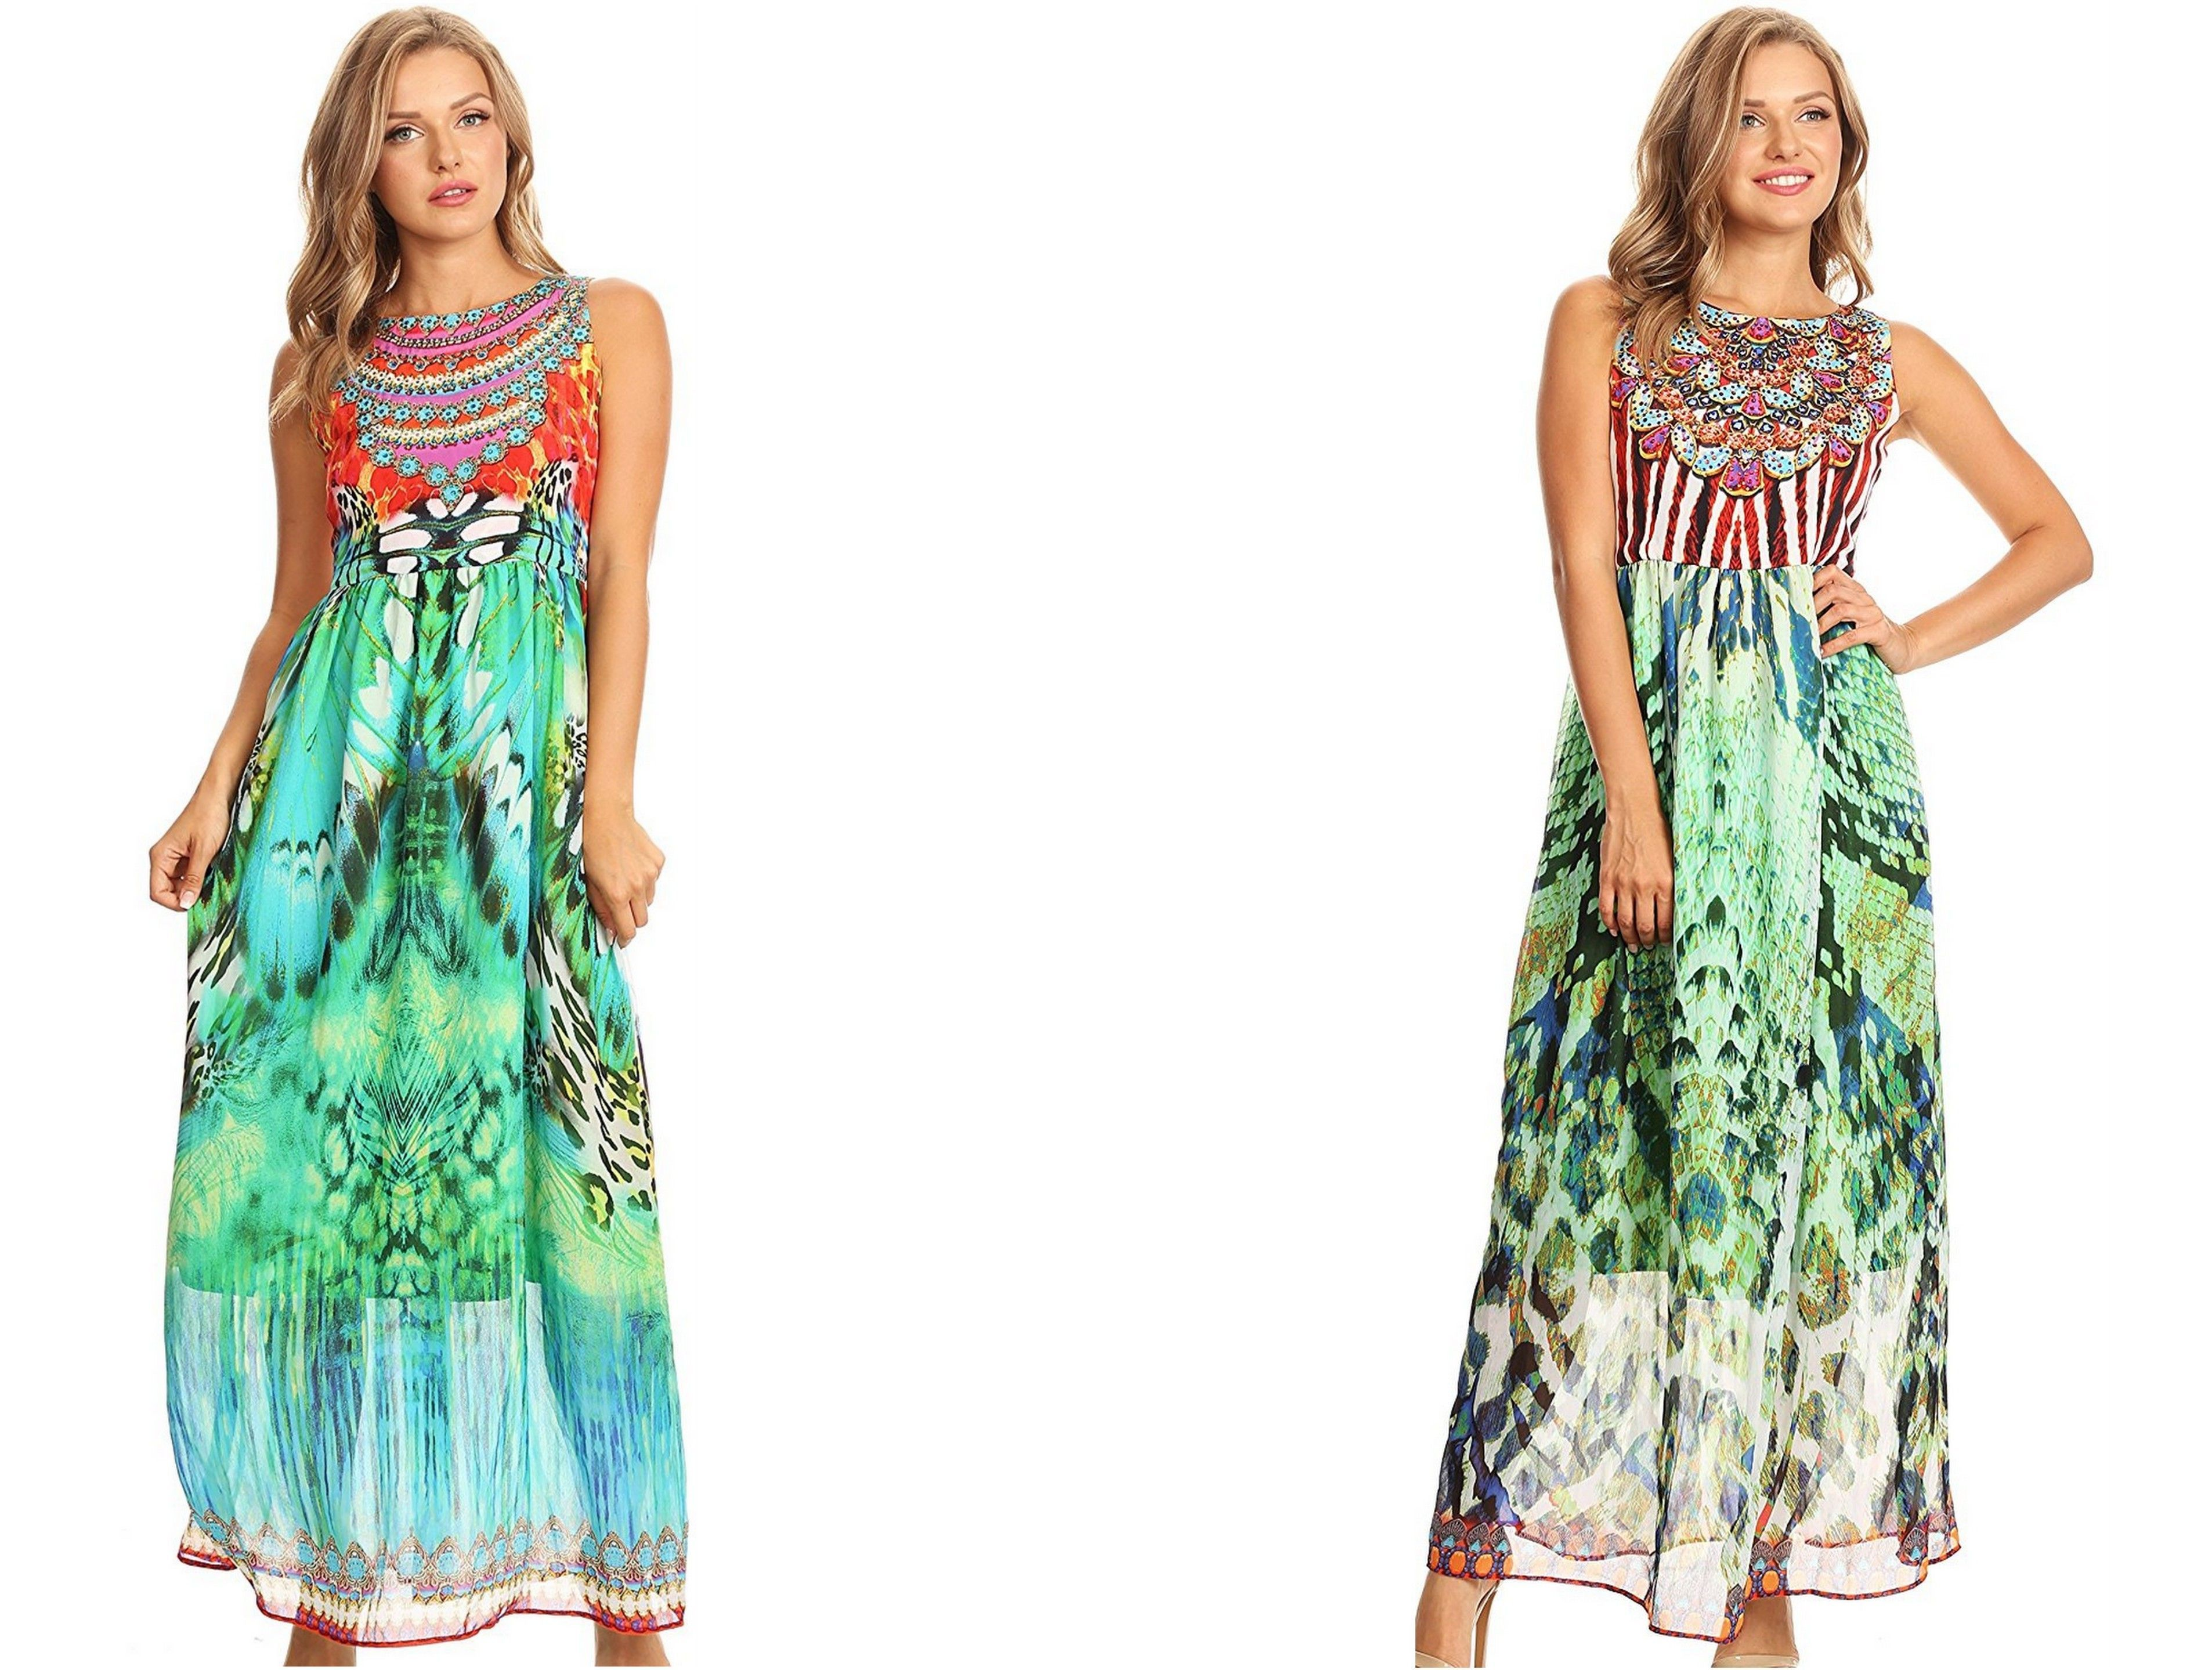 Sakkas afia animal print empire waist sleeveless long dress with